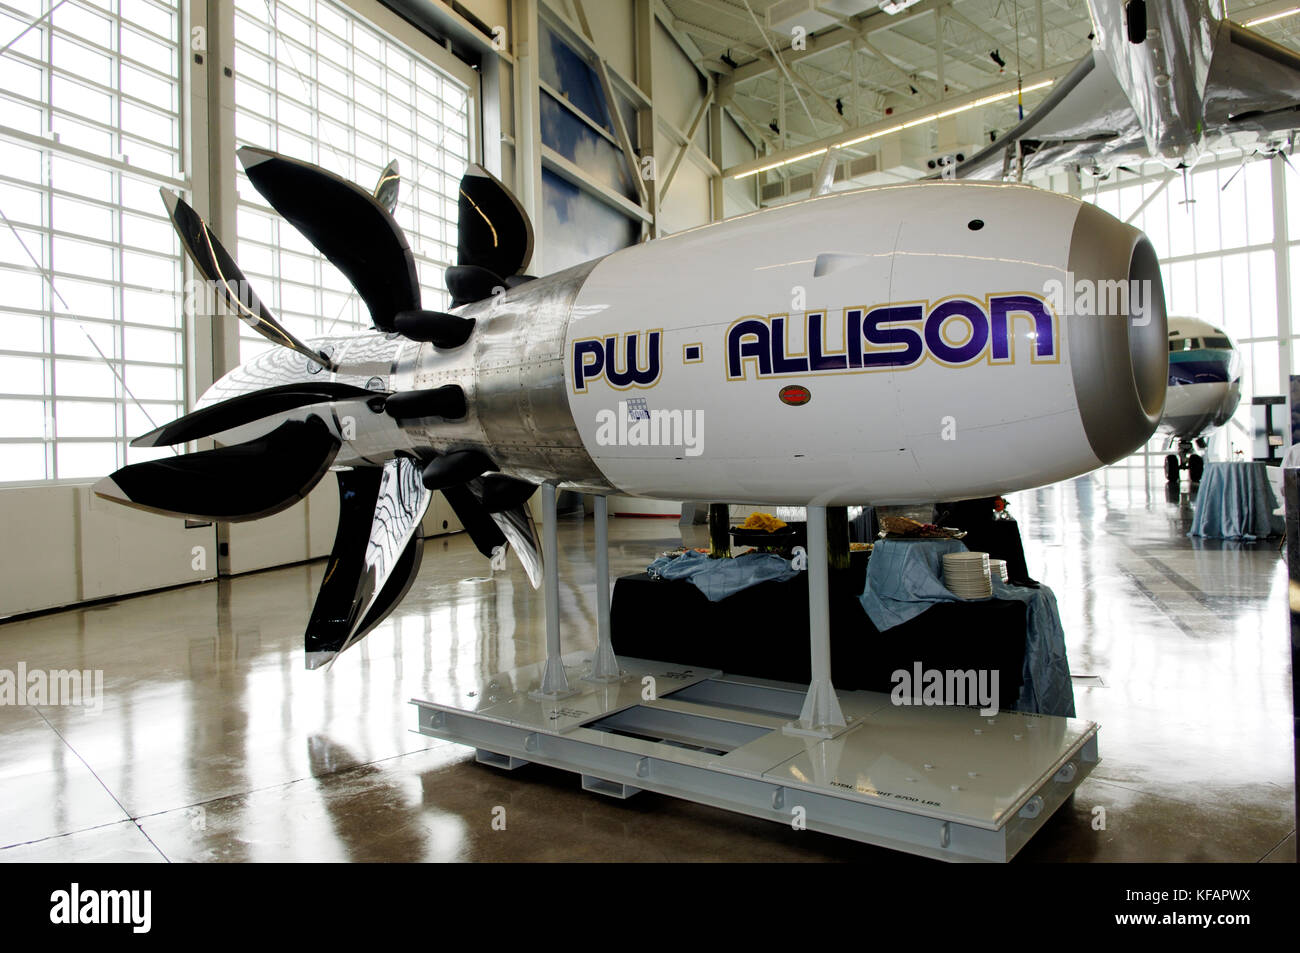 Pratt & Whitney / Allison 578-DX UDF with large propeller blades on display - Stock Image